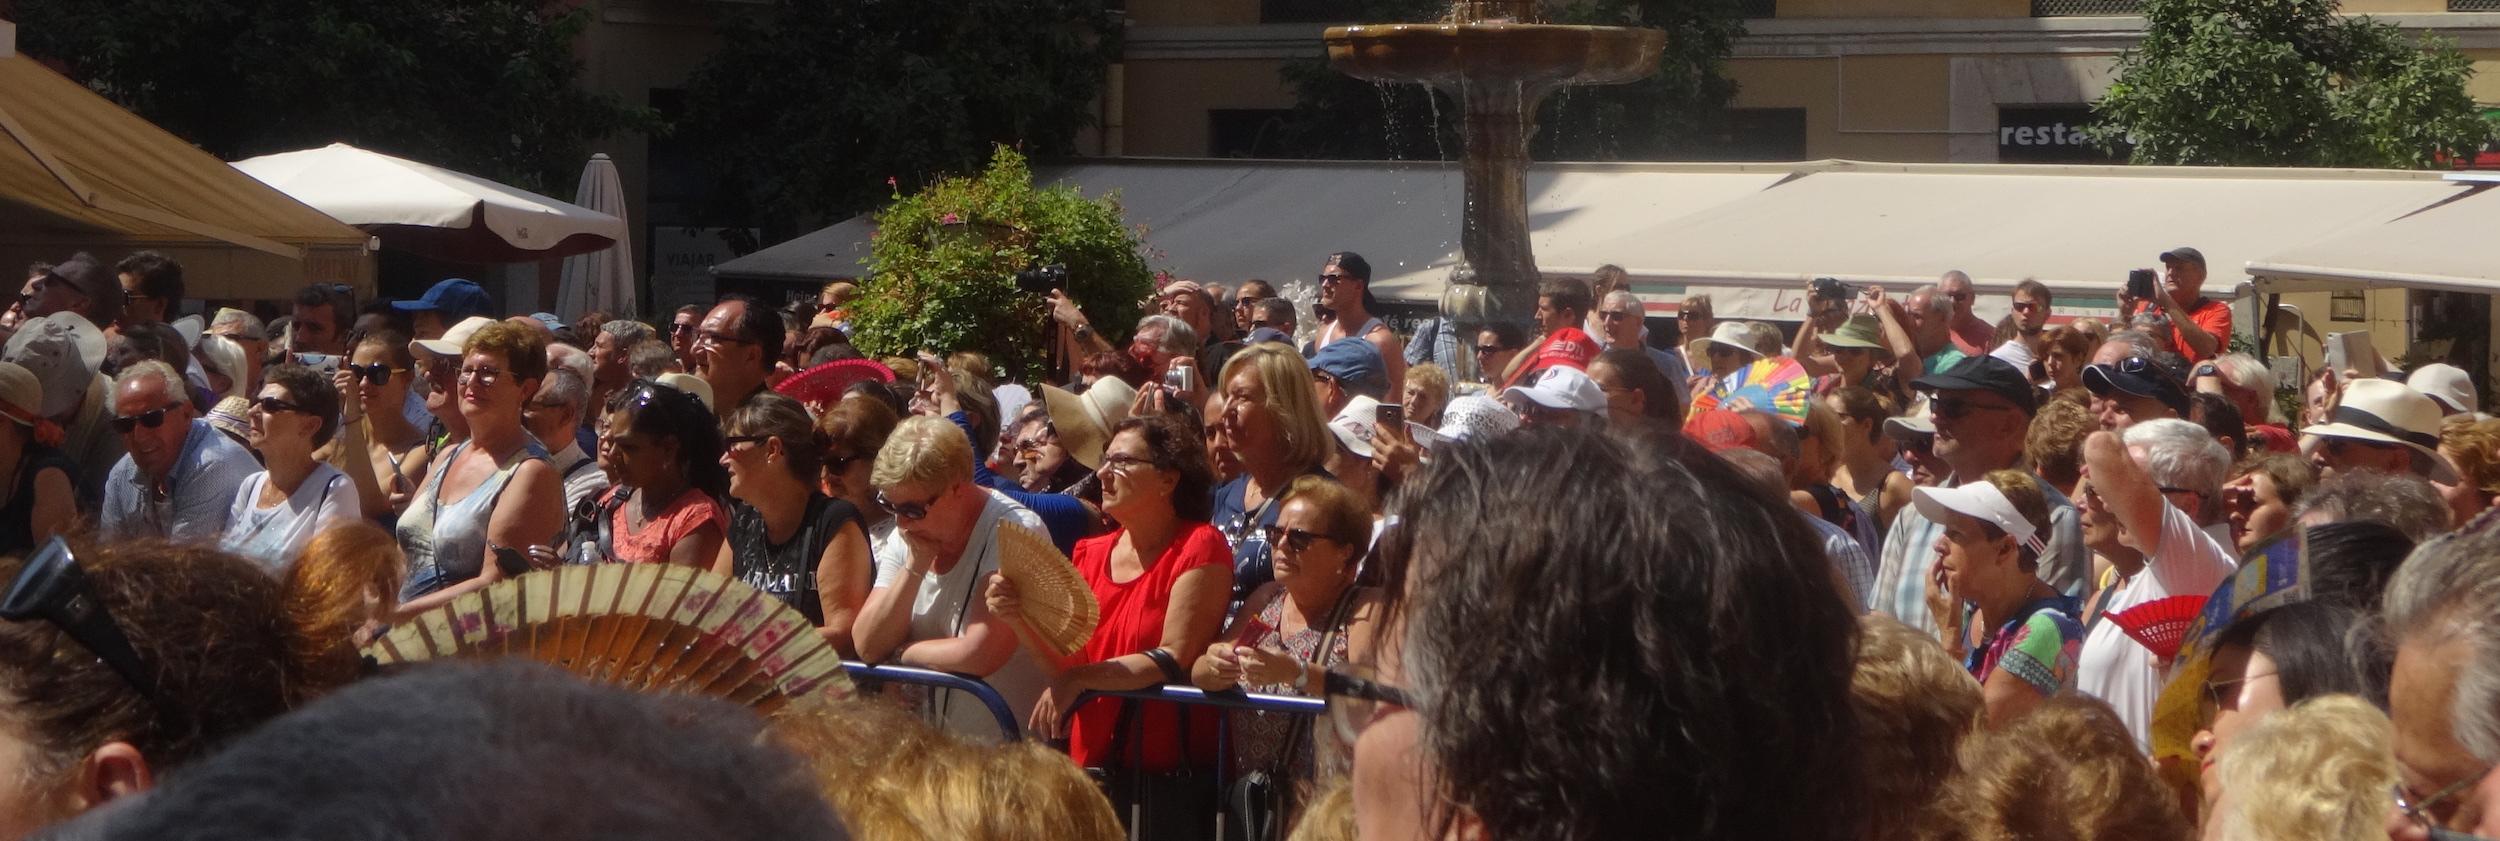 Dia de Asturias is when you should be in Malaga